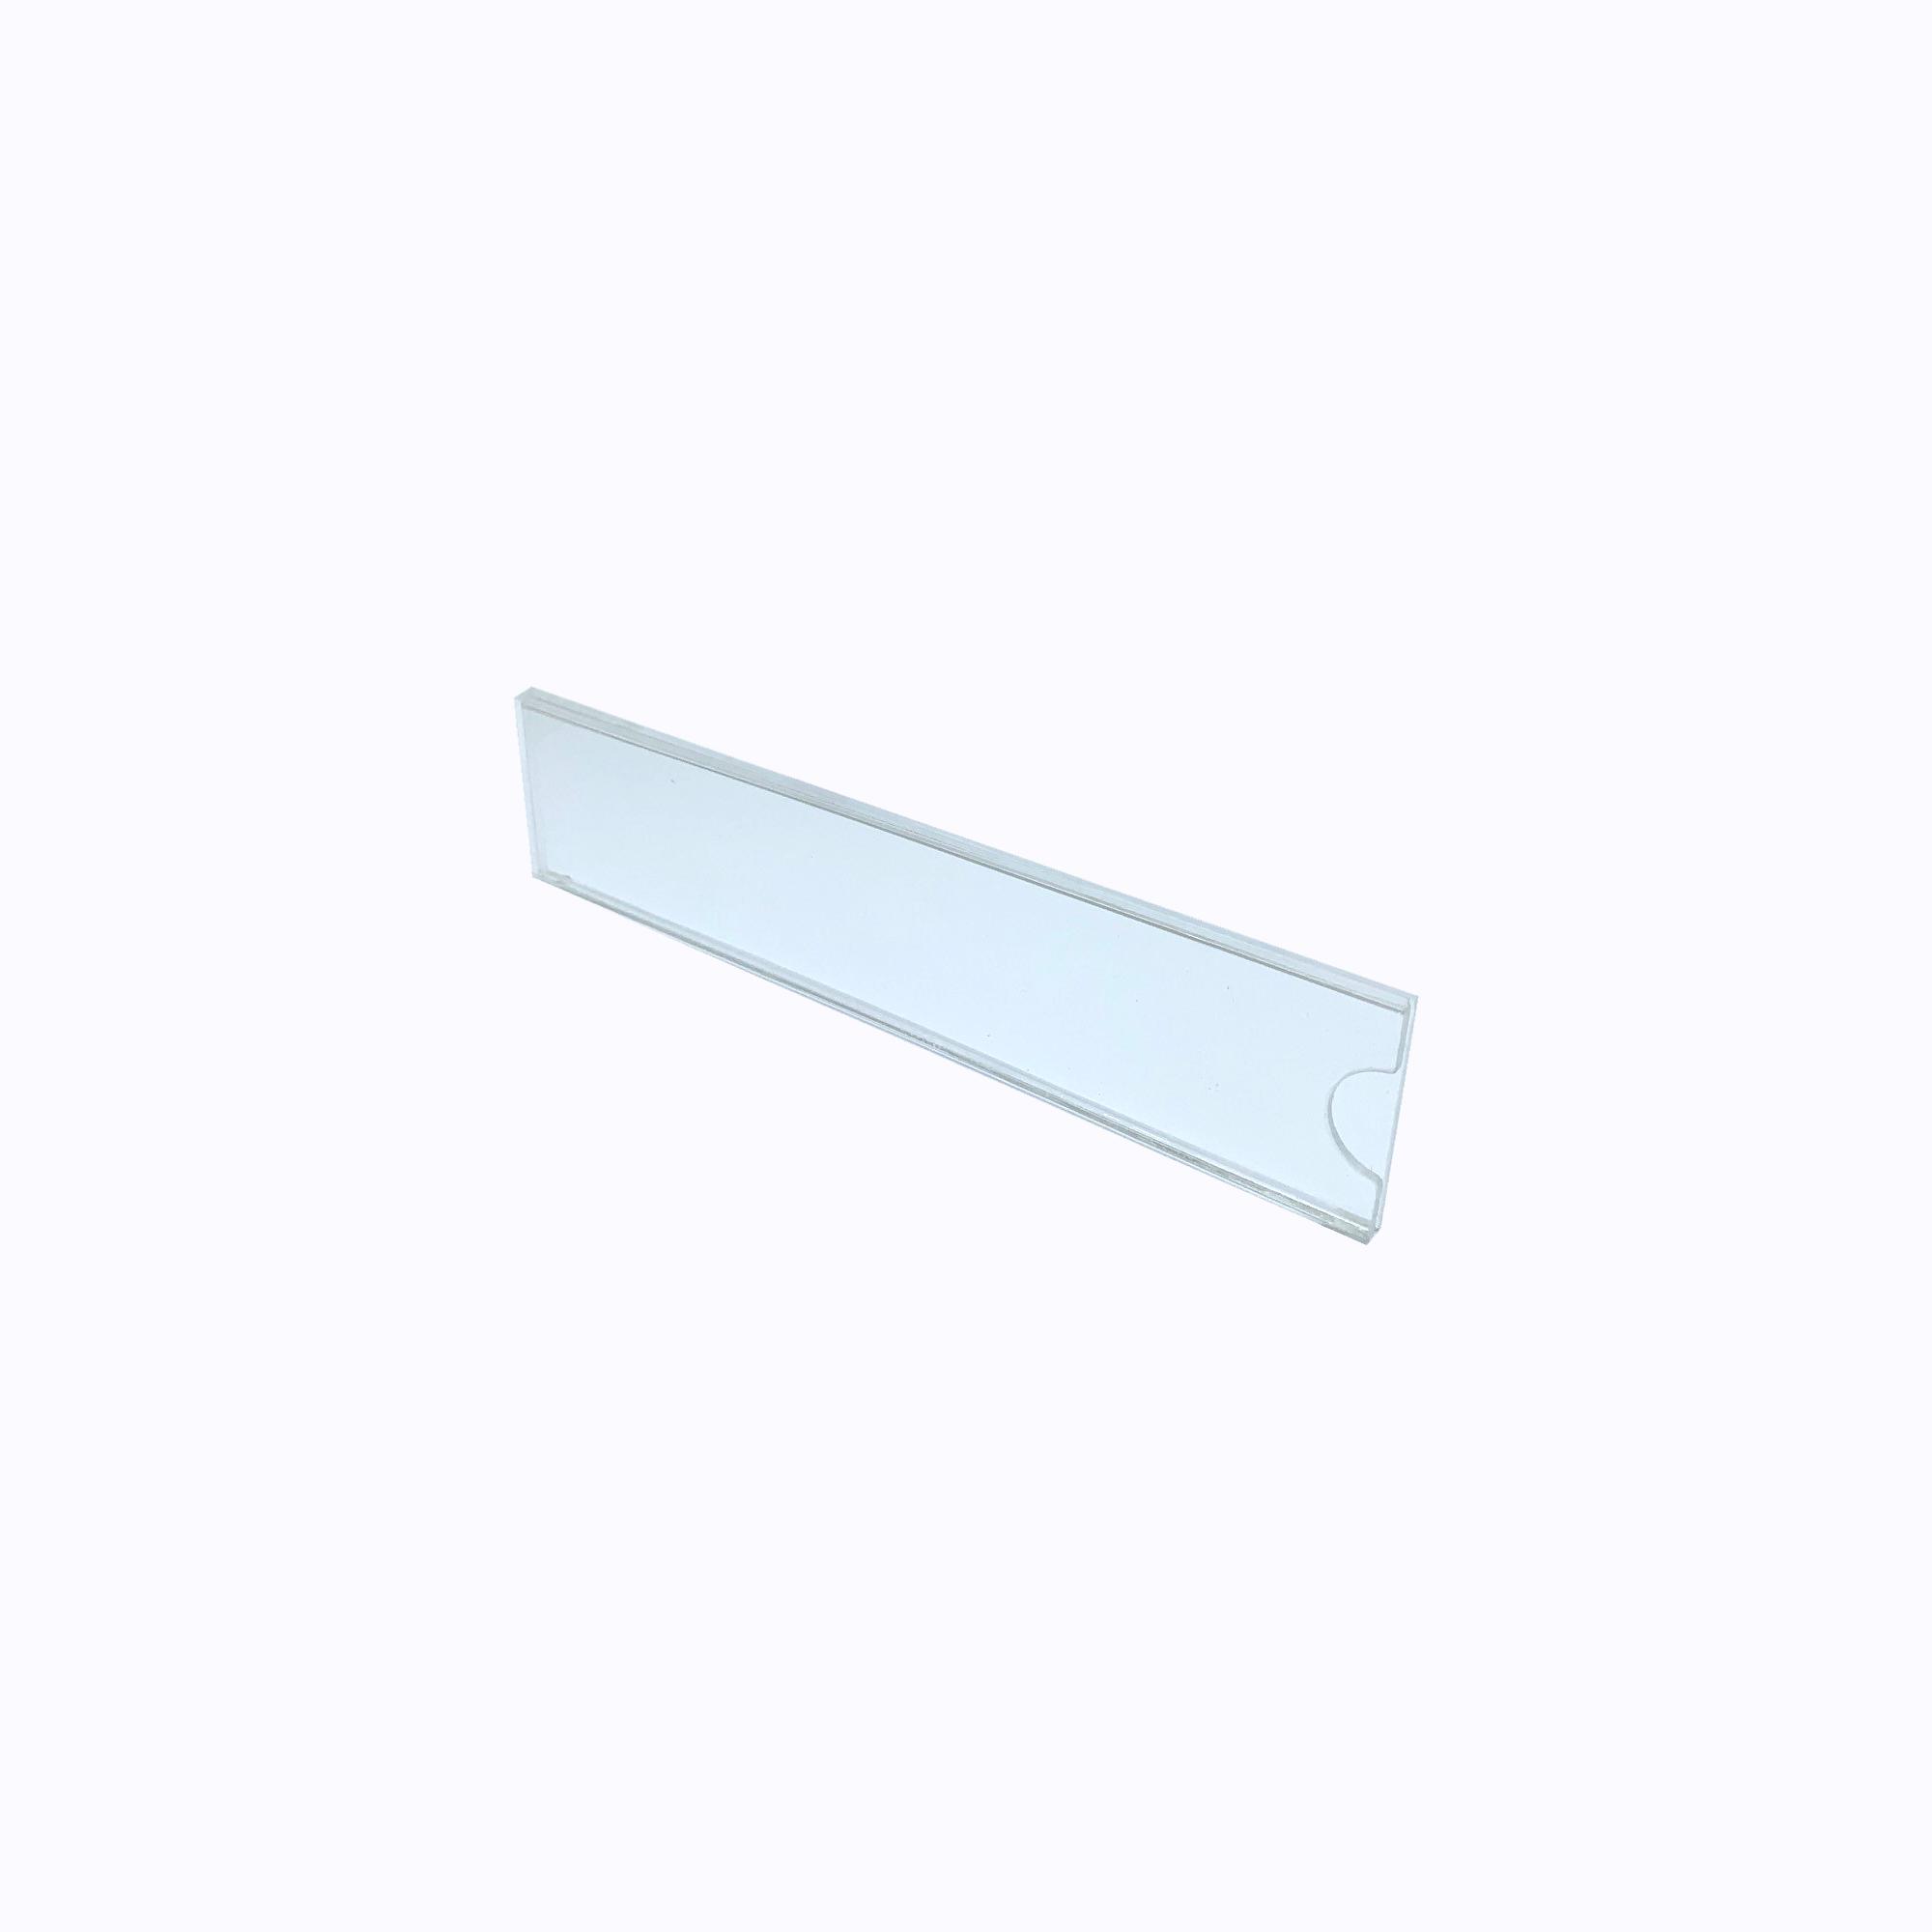 Acrylic Pocket Wall Frame - 40mm x 200mm